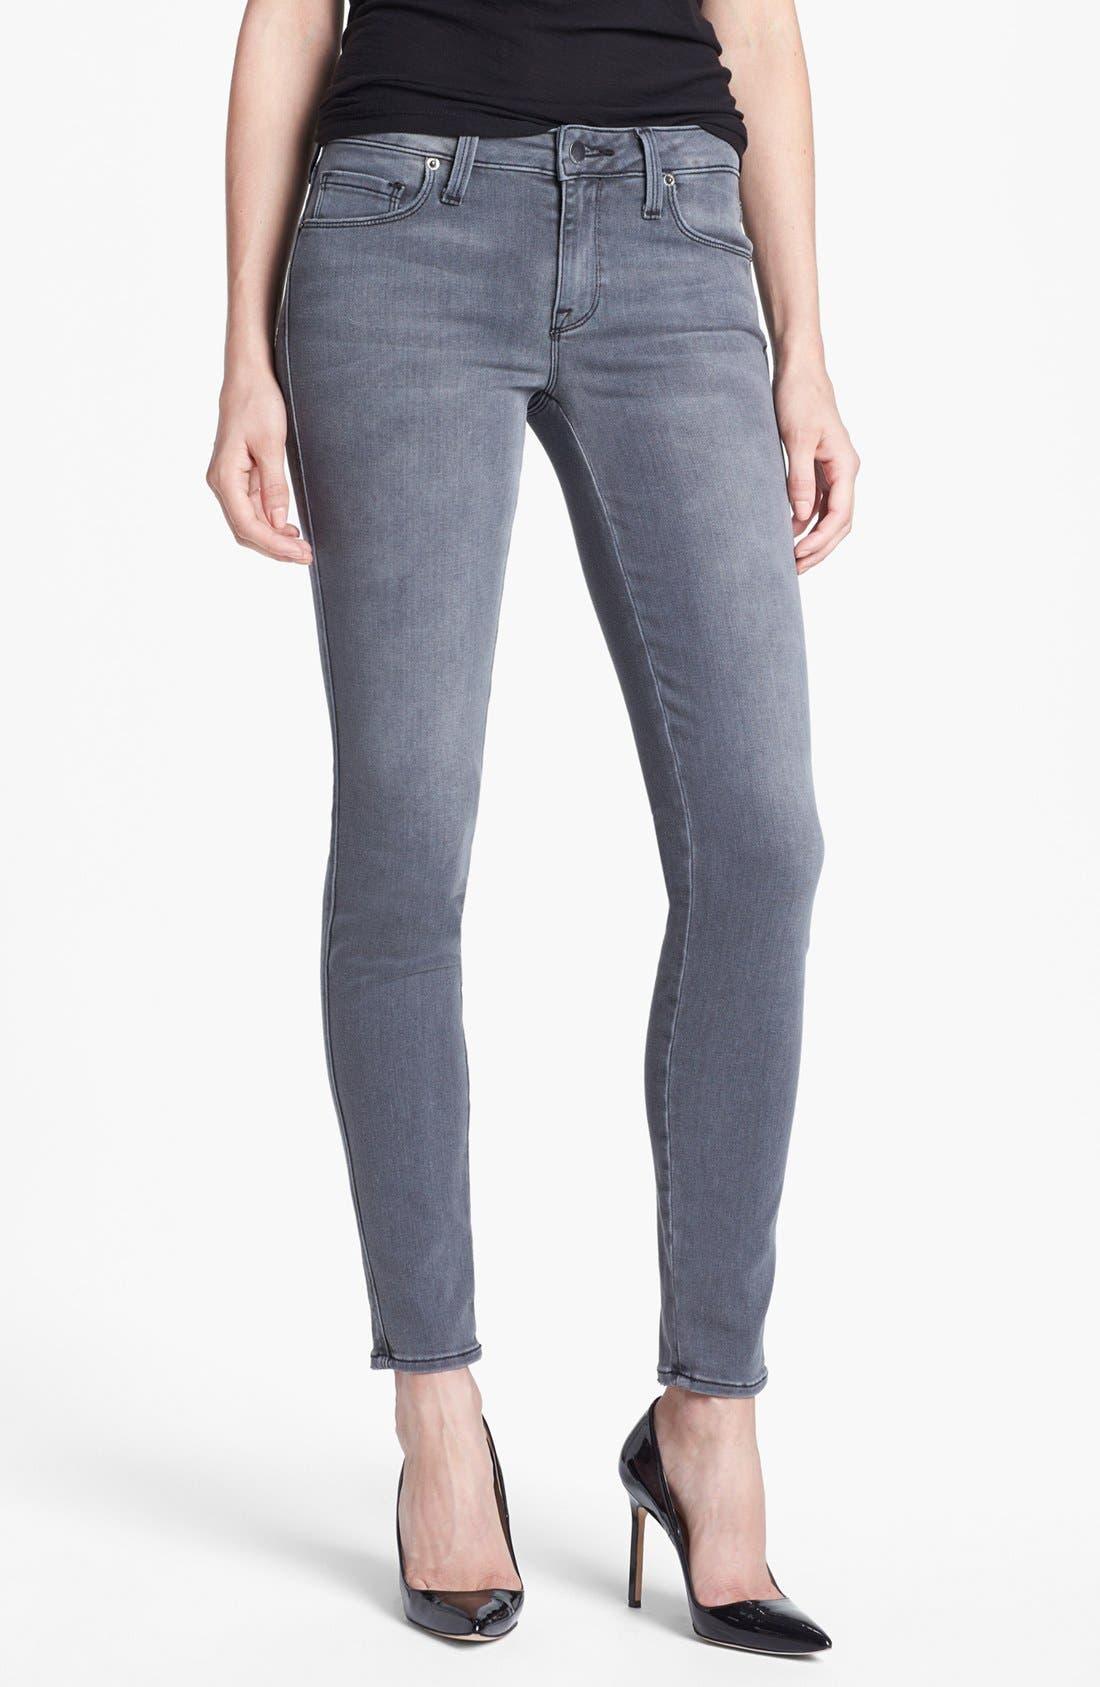 Main Image - Genetic 'Shya' Cigarette Skinny Jeans (Gaze)